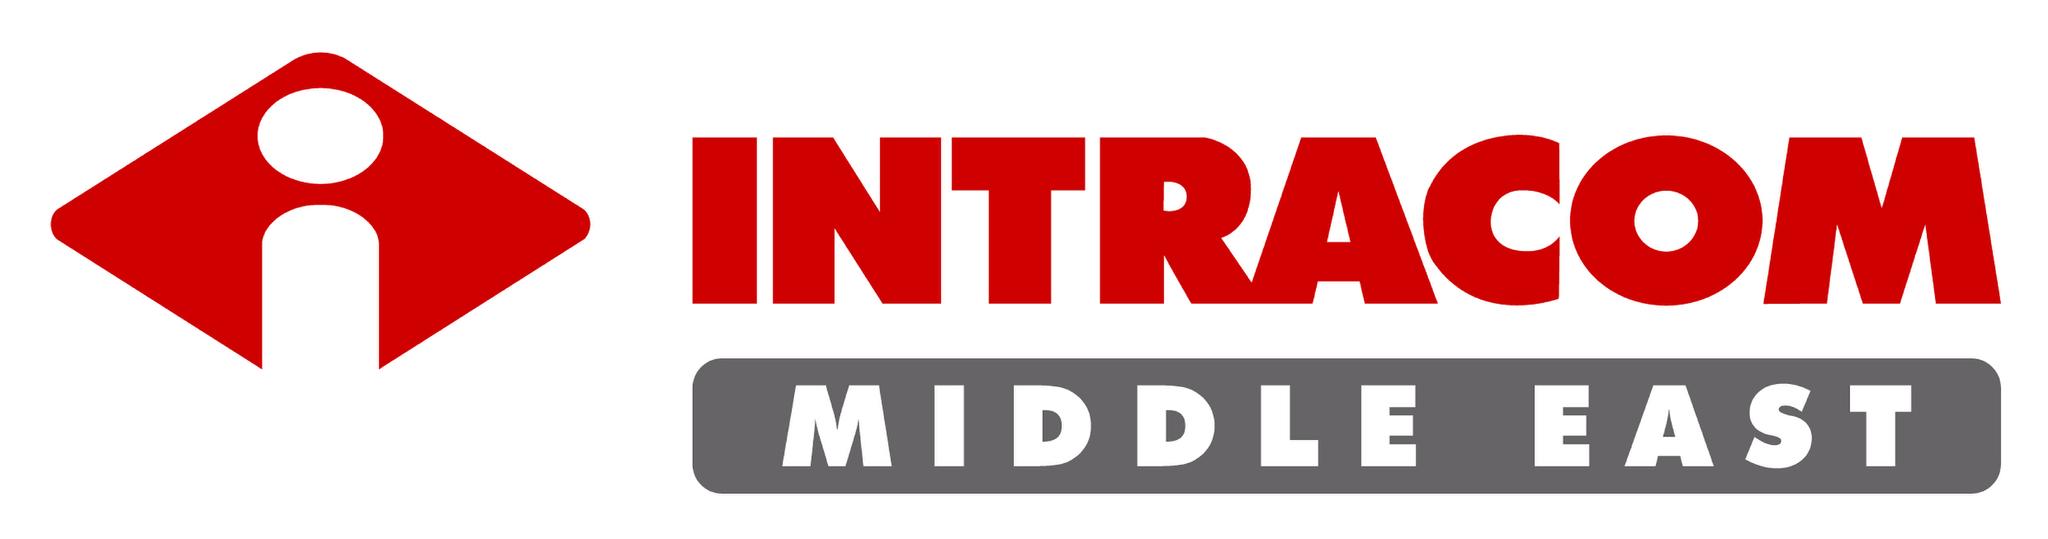 Intracom Middle East FZ LLC